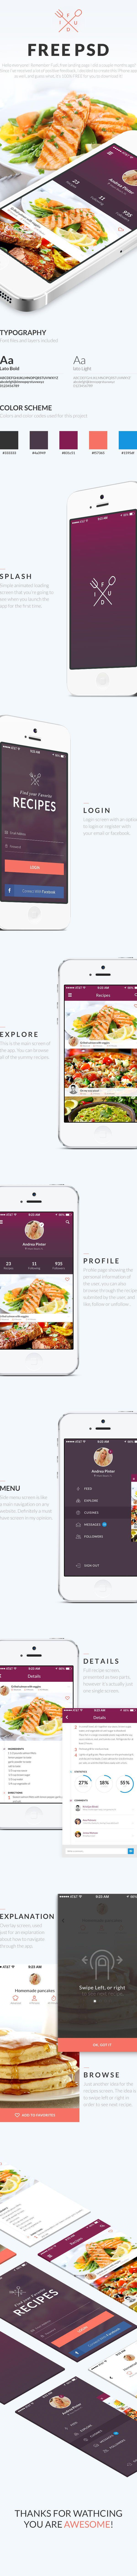 FREE PSD! Flat Mobile App UI on Behance